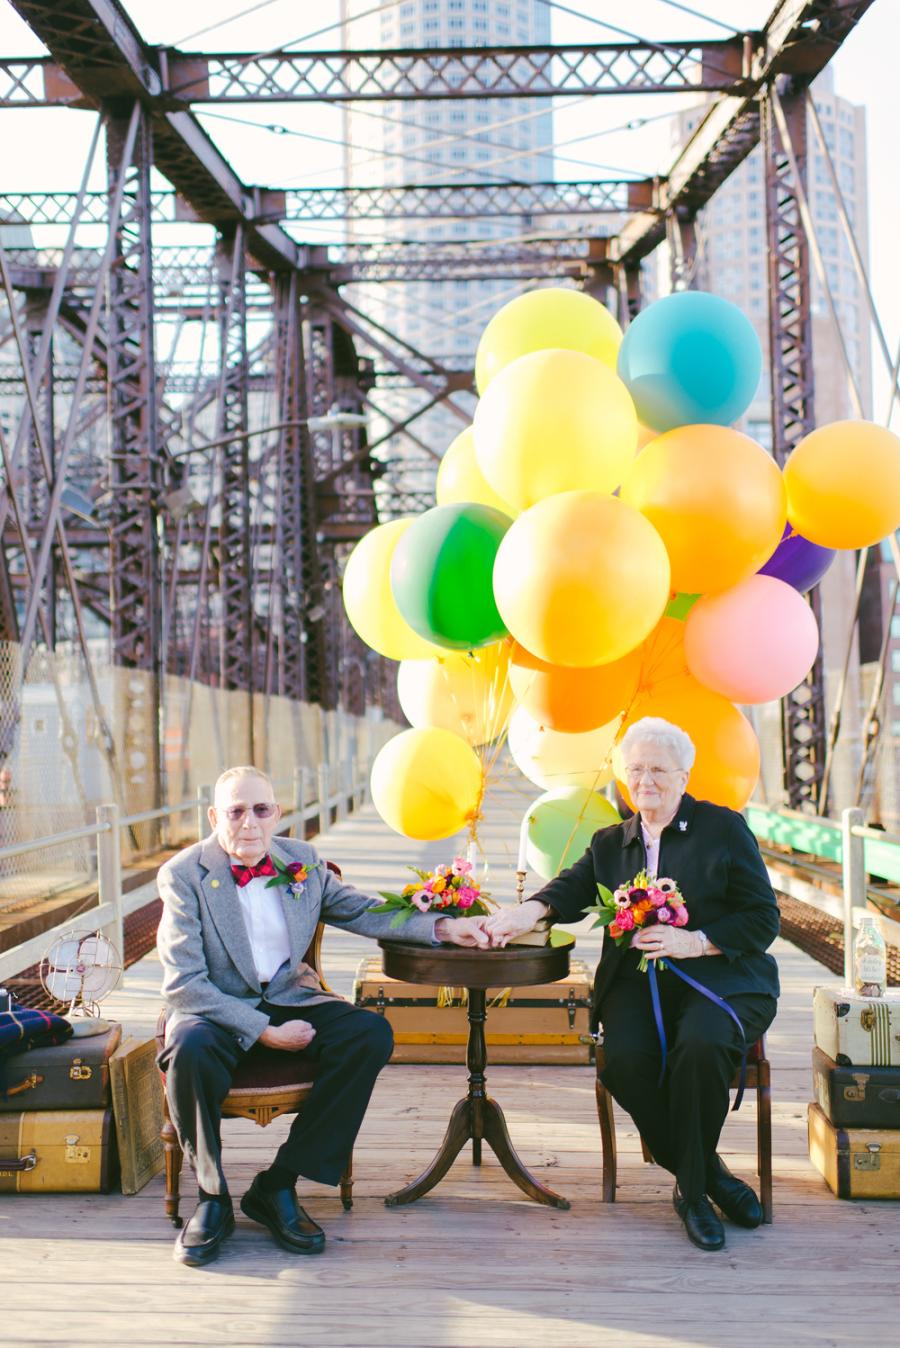 anniversary photo balloons